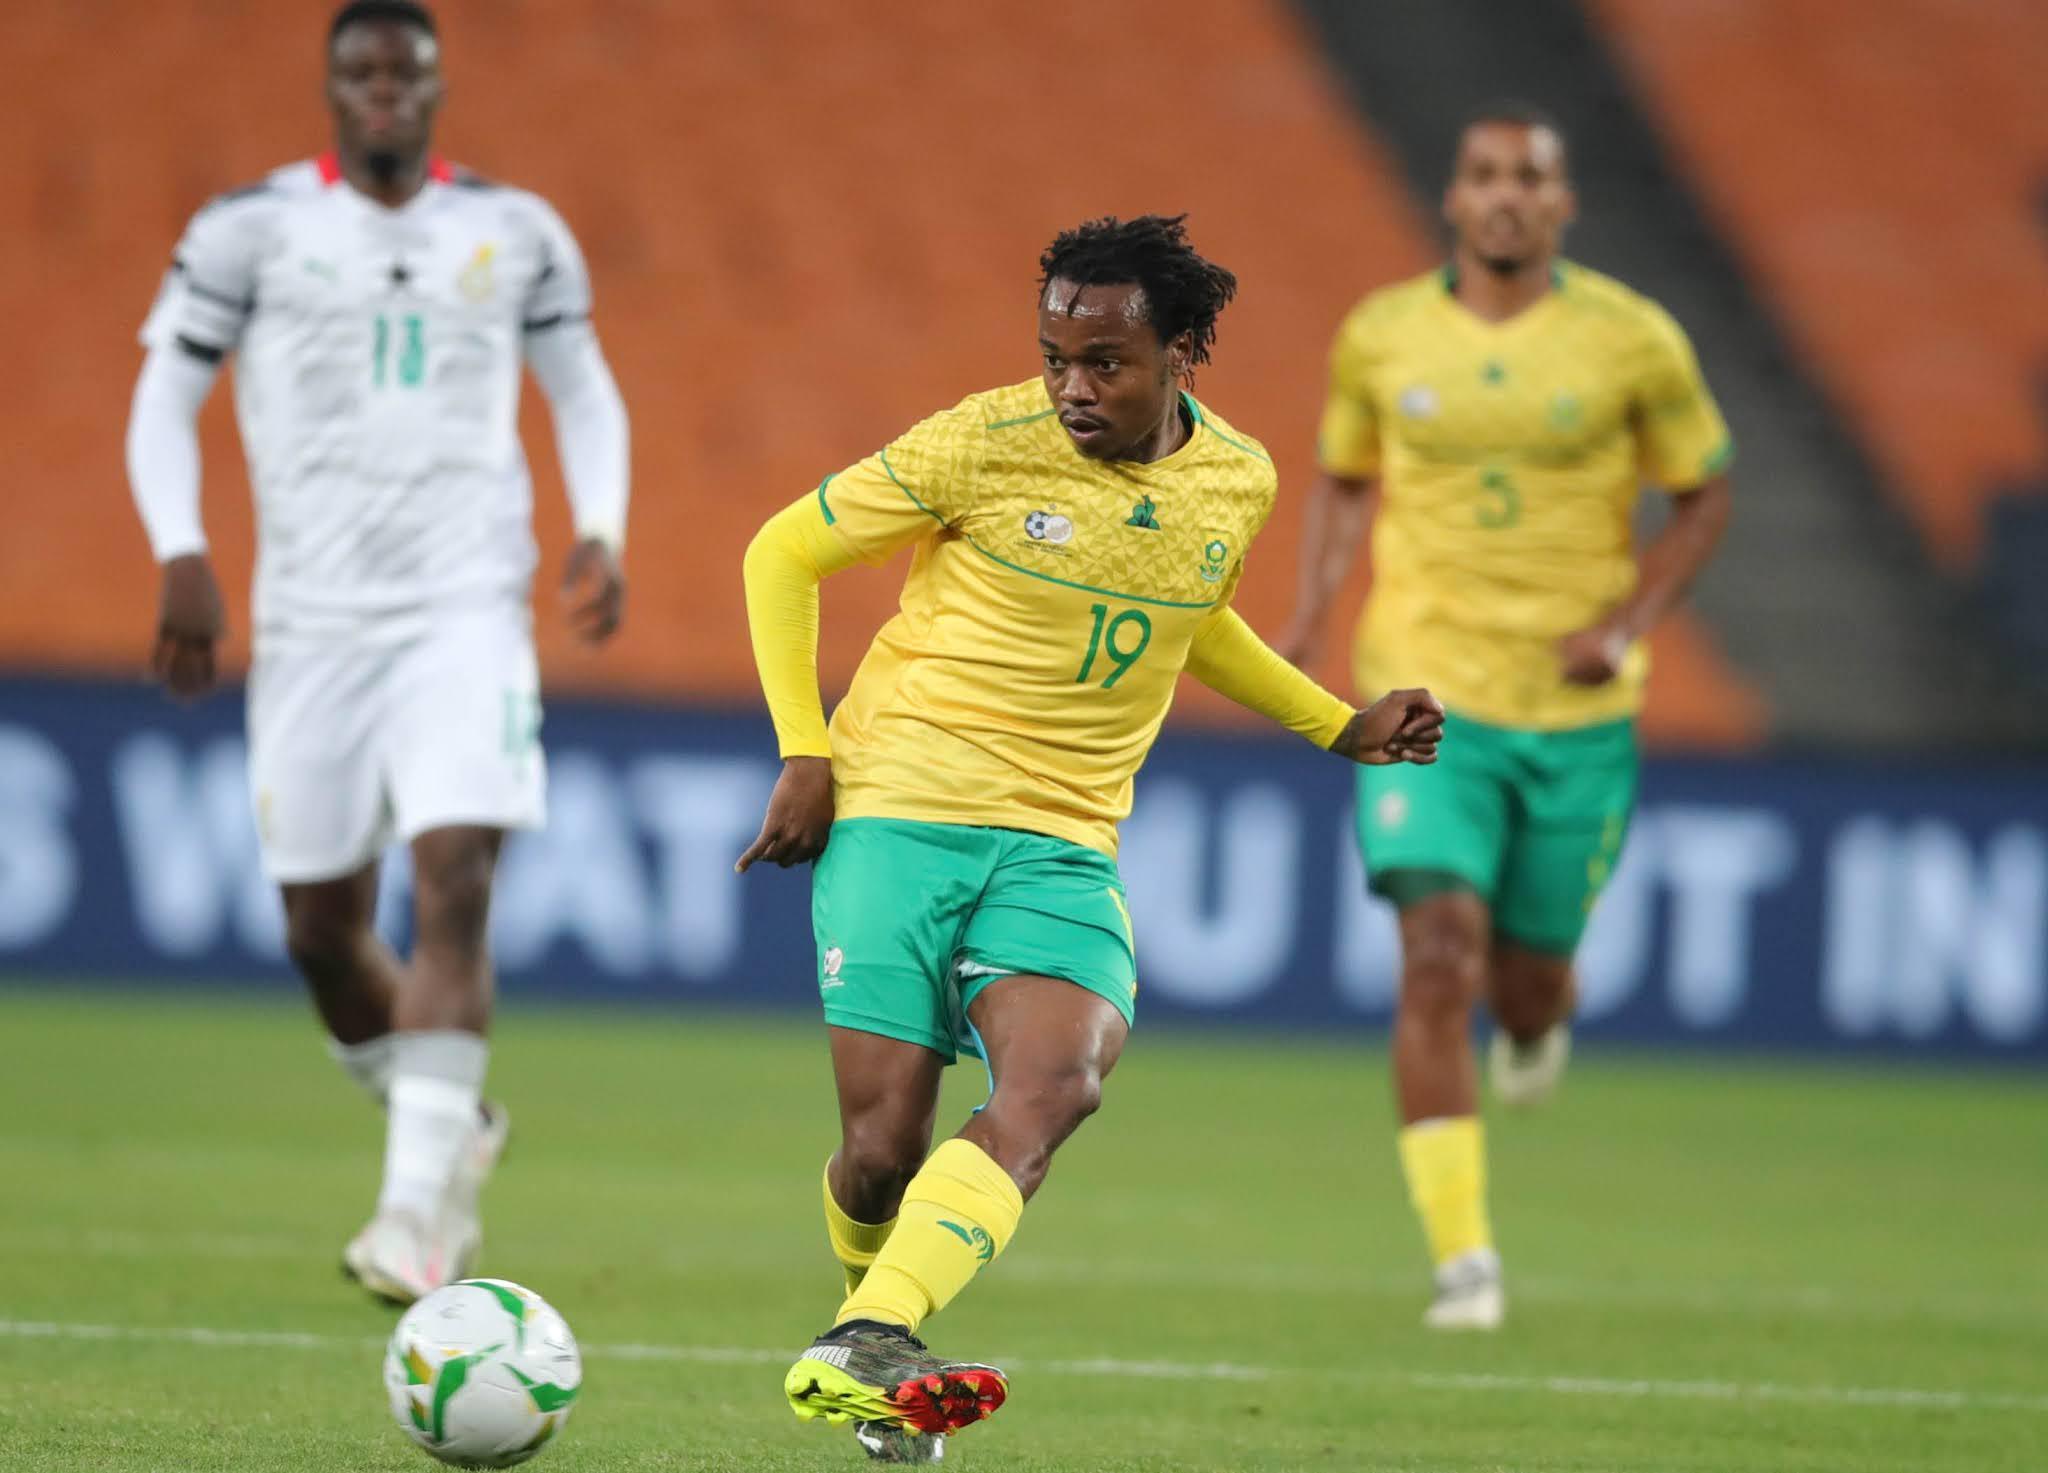 South African midfielder Percy Tau